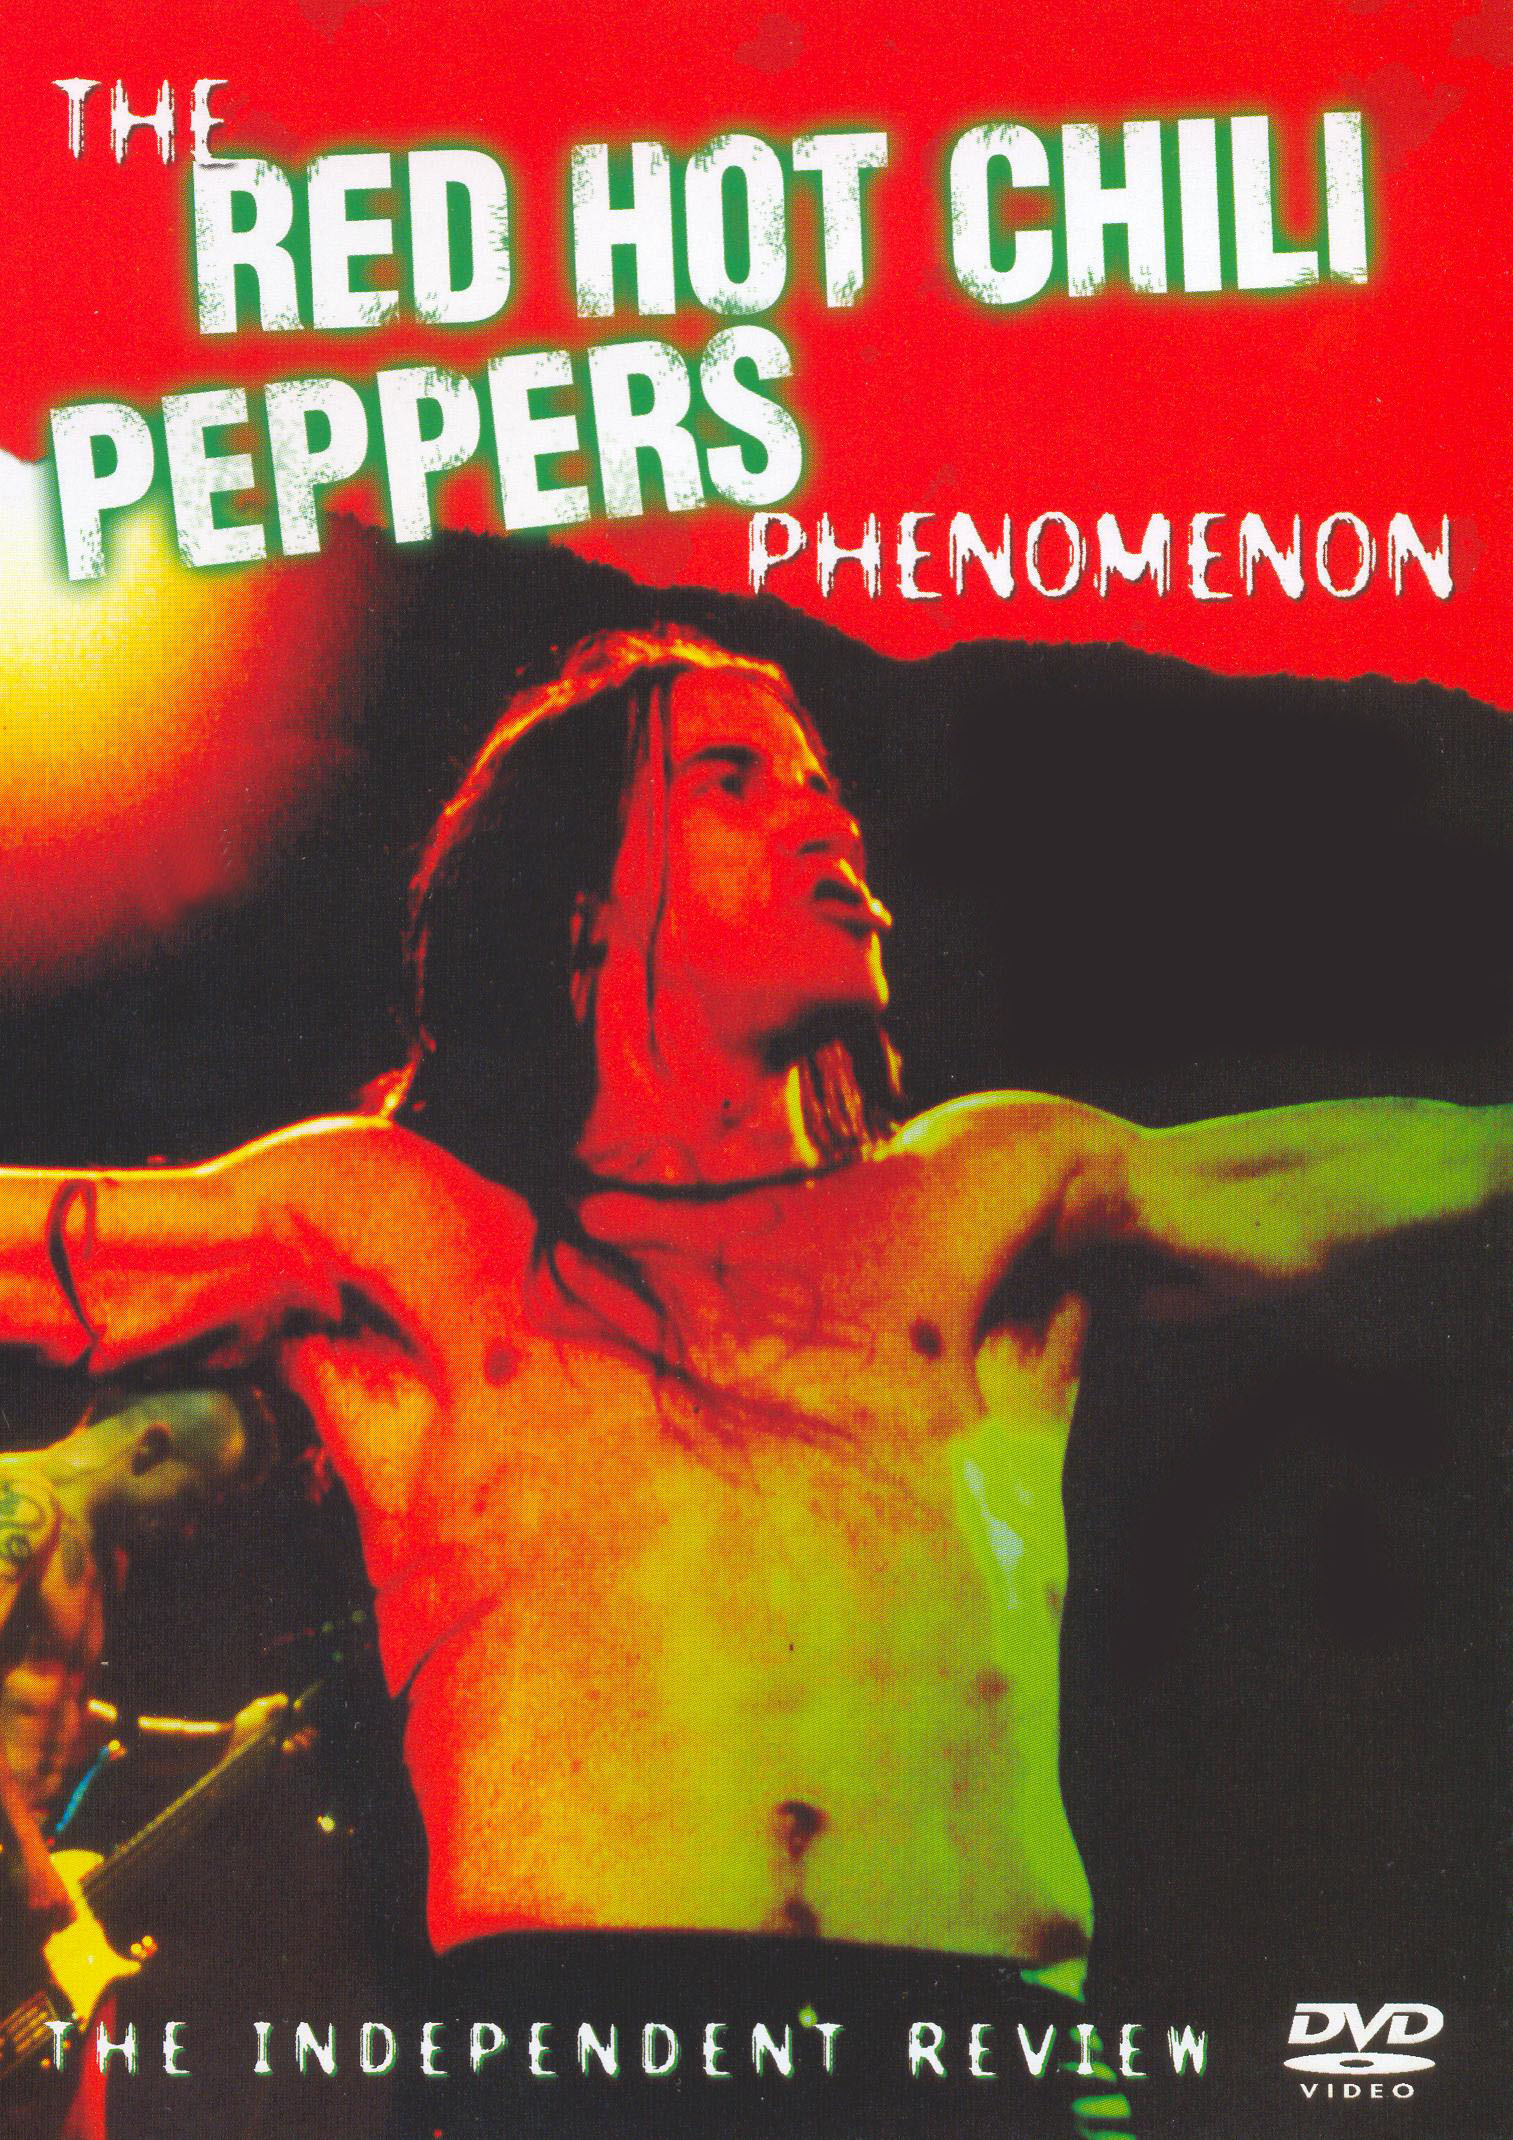 Red Hot Chili Peppers: Phenomenon